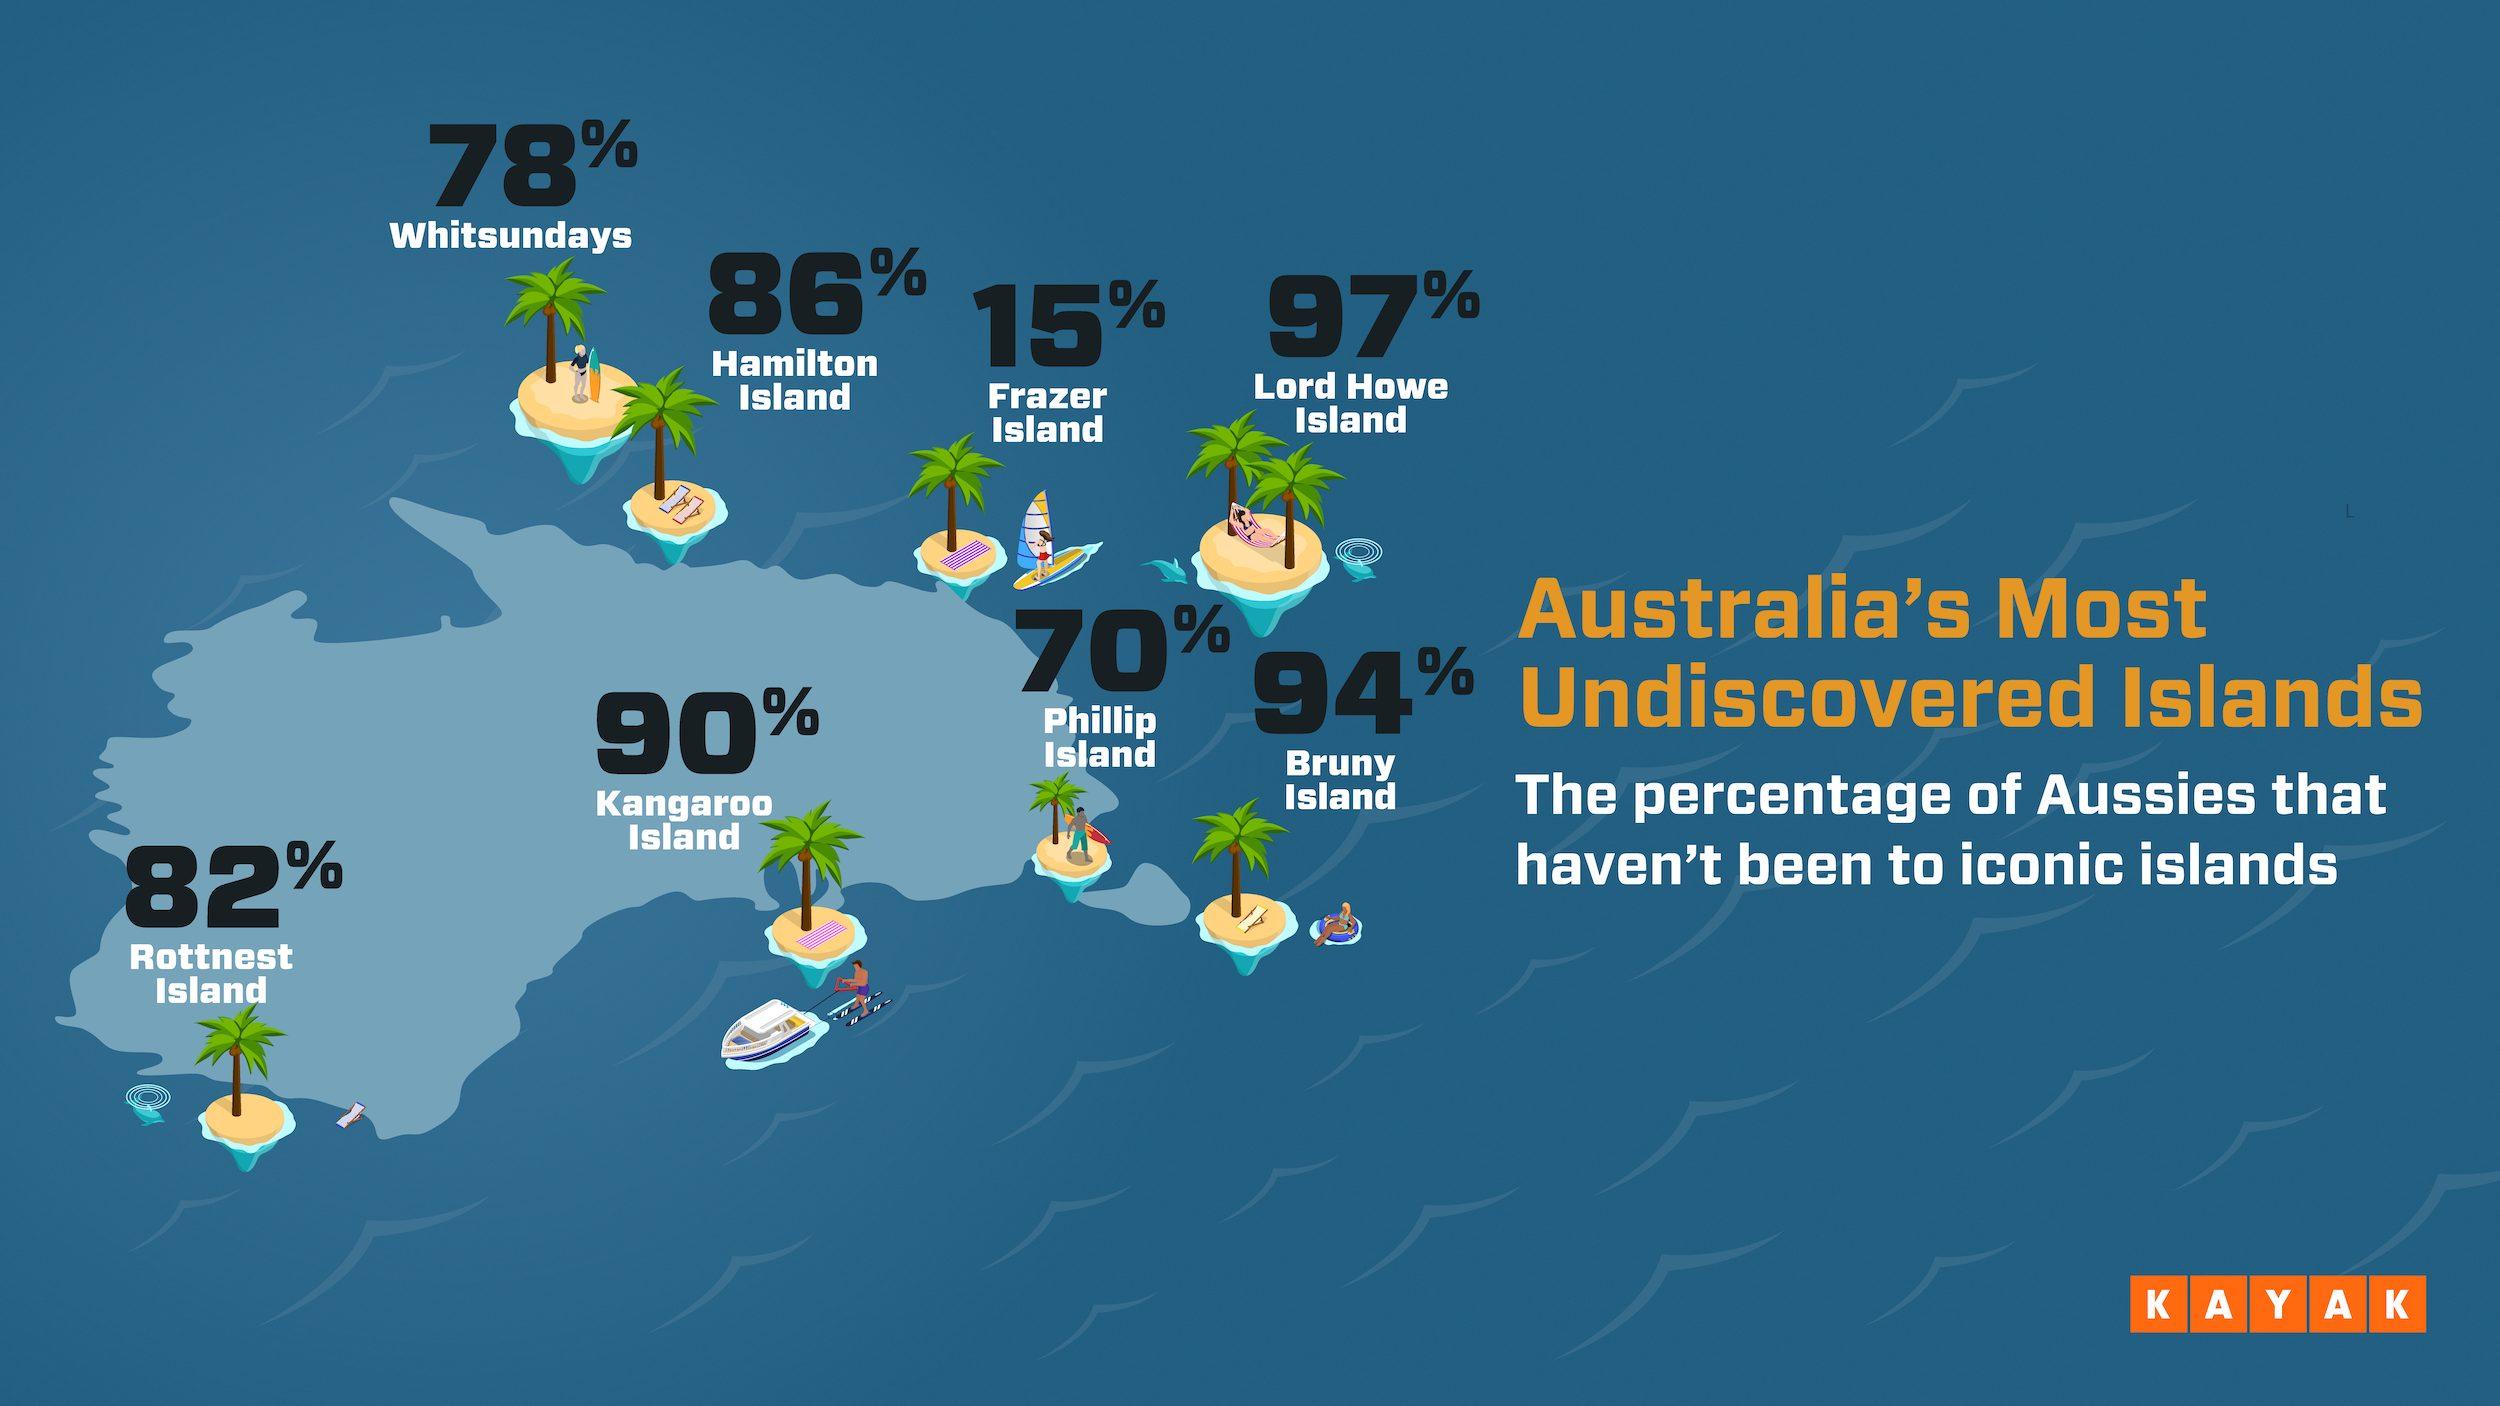 Australia's Most Undiscovered Islands